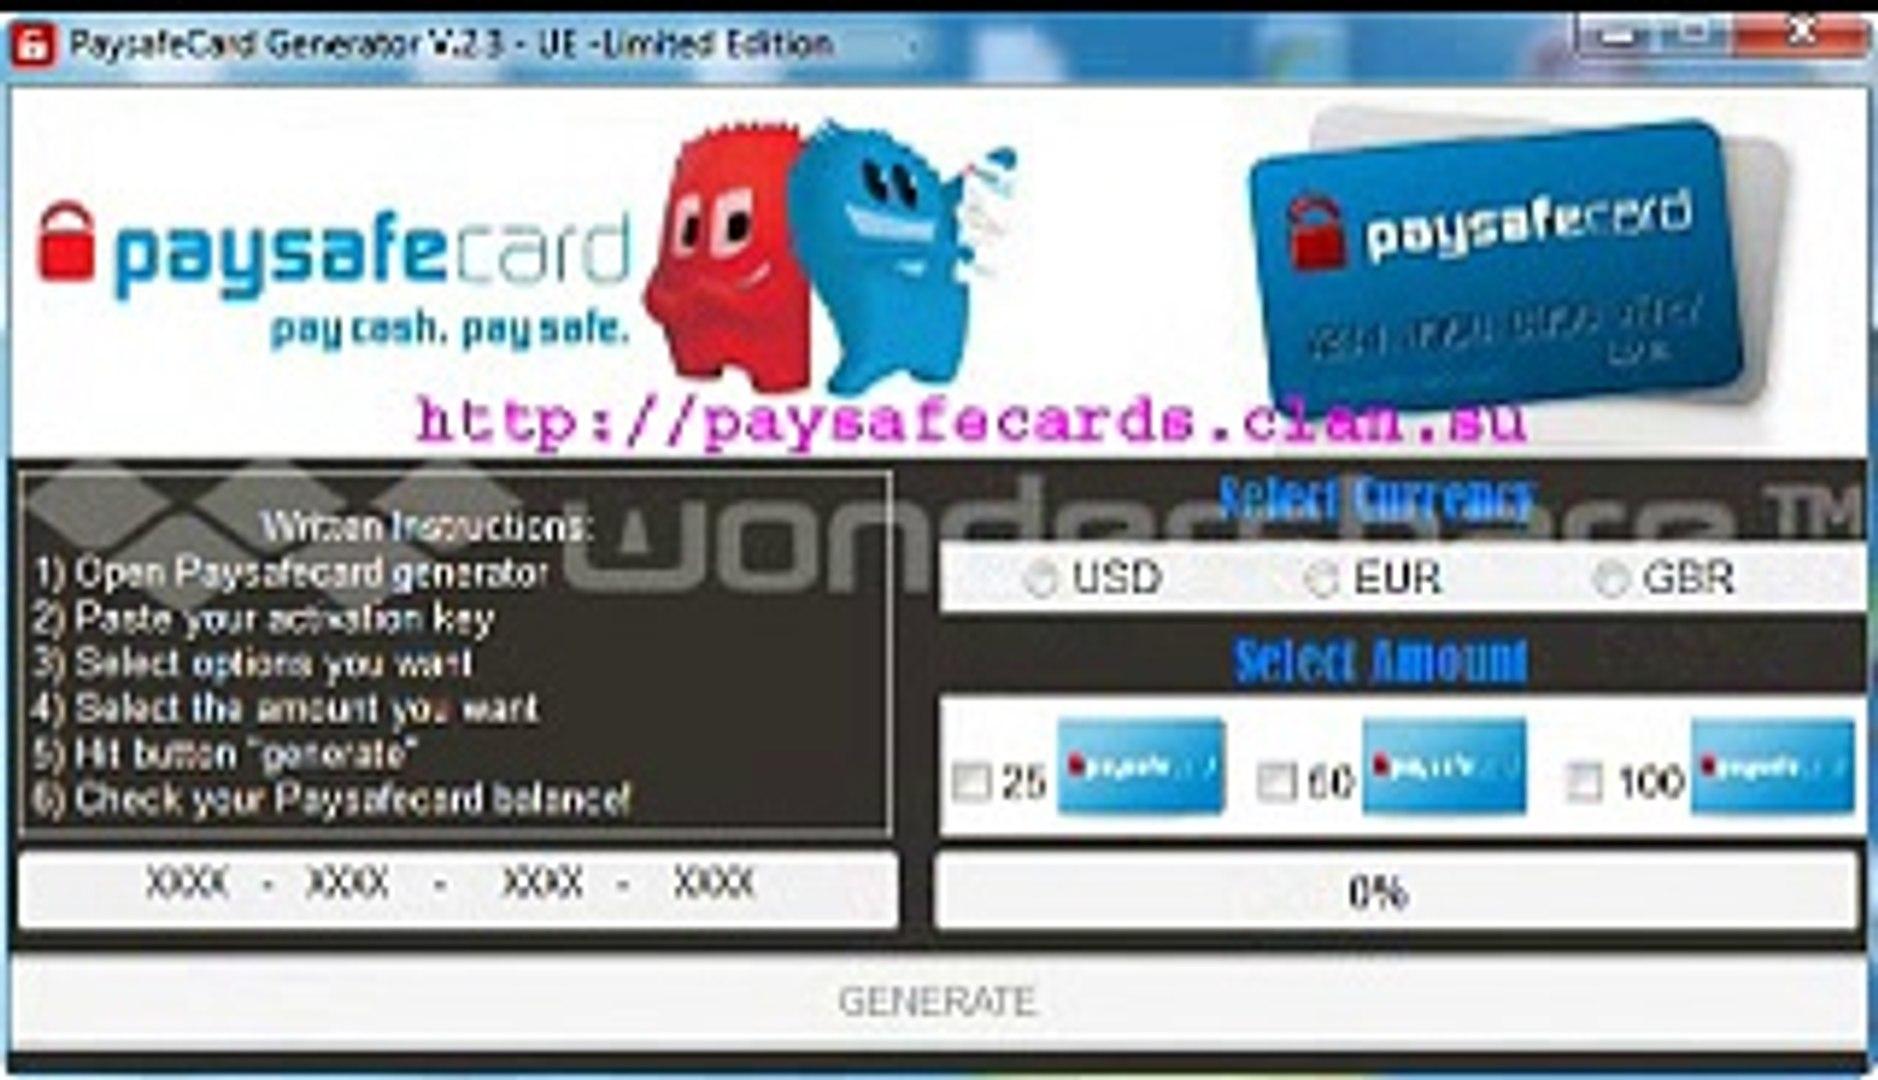 PaySafeCard Code Generator - PaySafeCard Codes UPDATED LINK December 2014